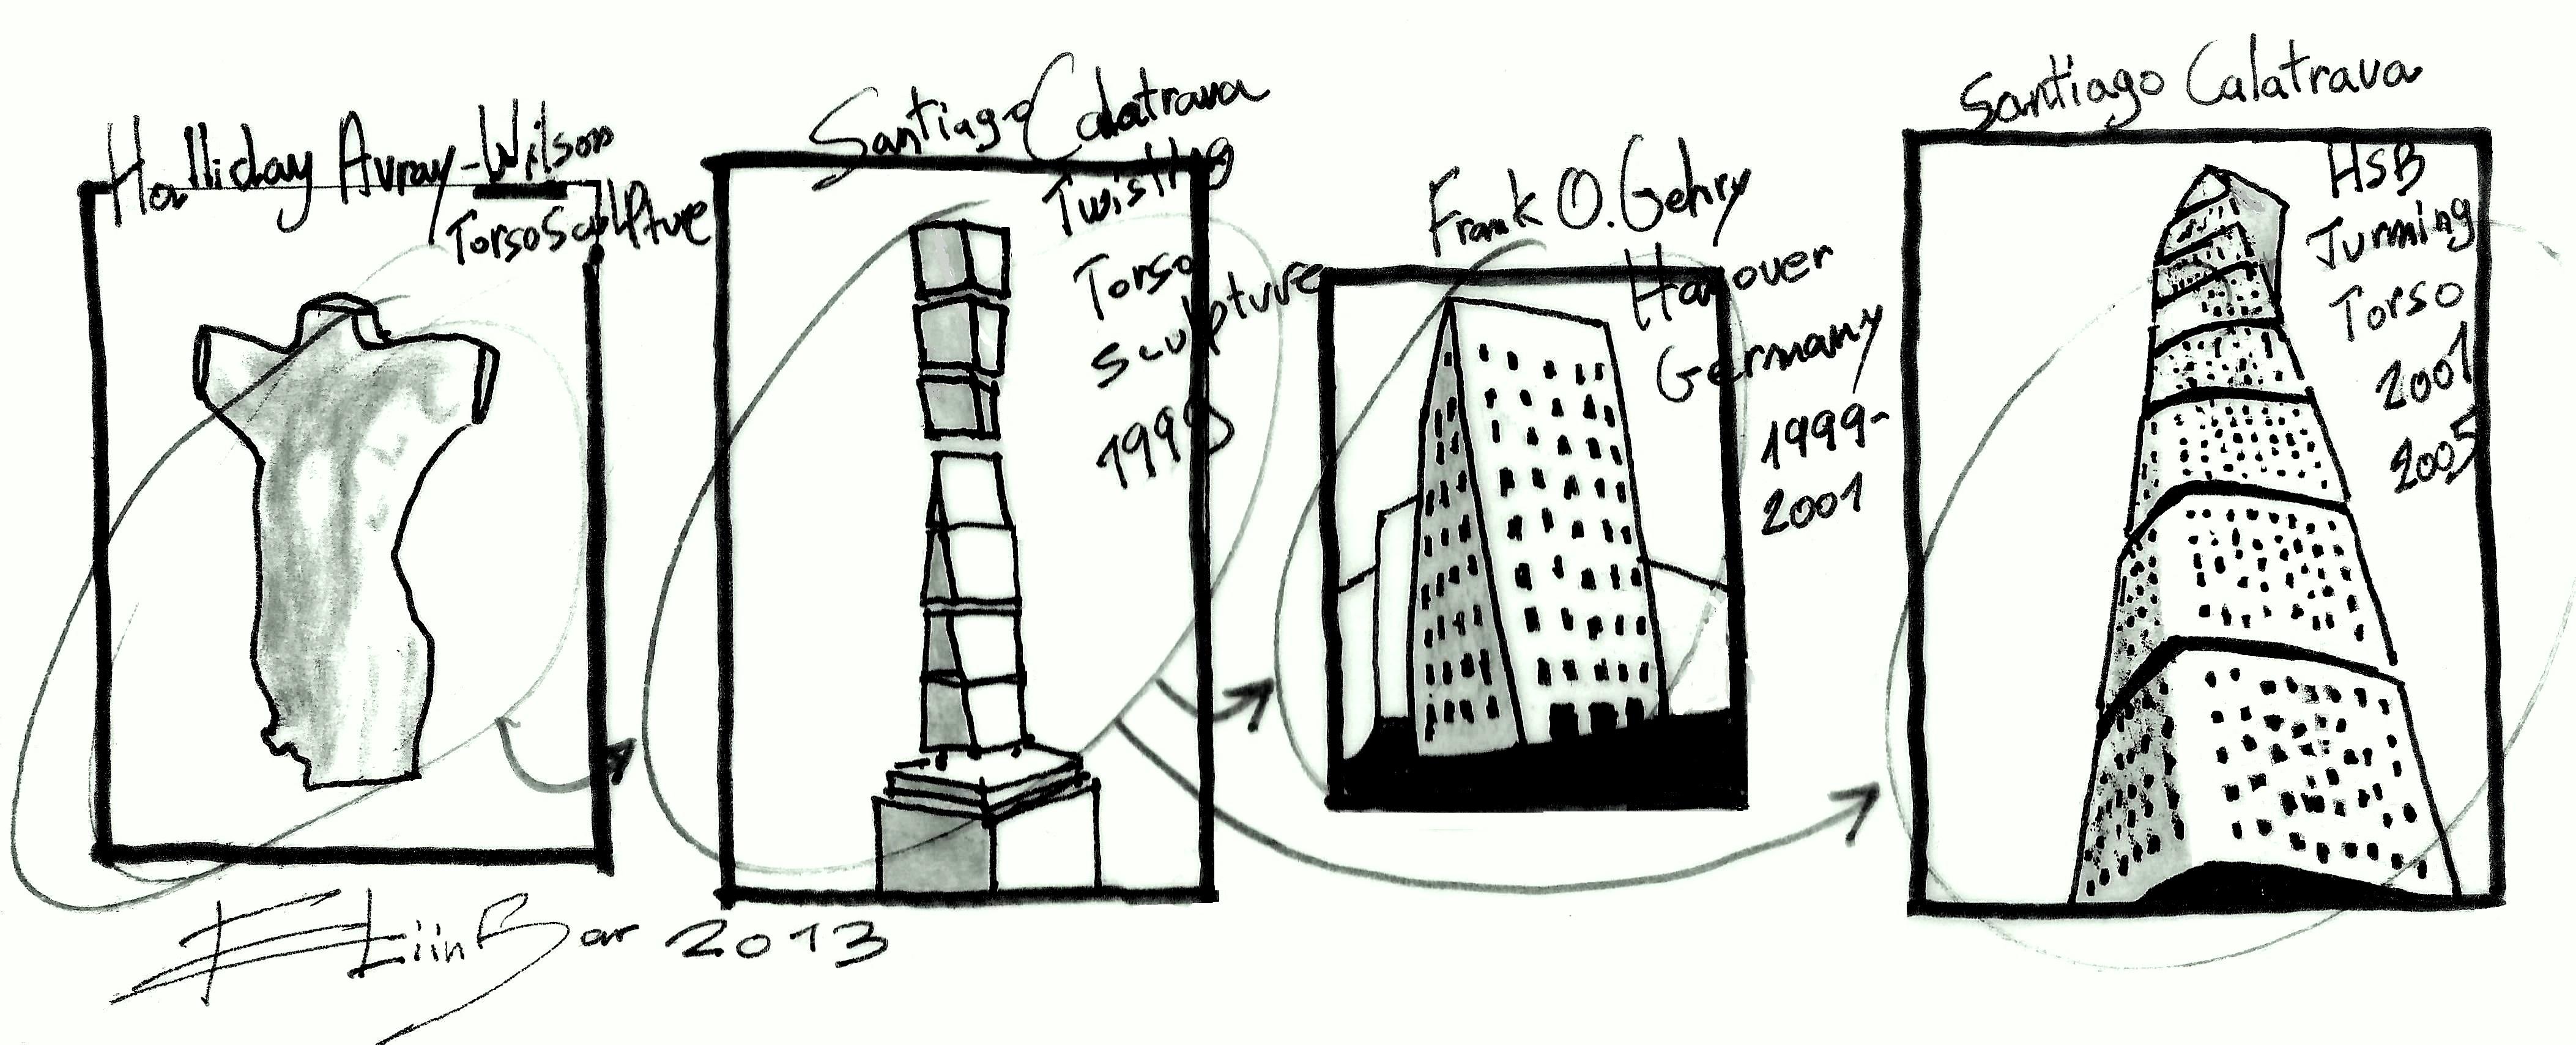 Santiago calatrava Eliinbar Sketches